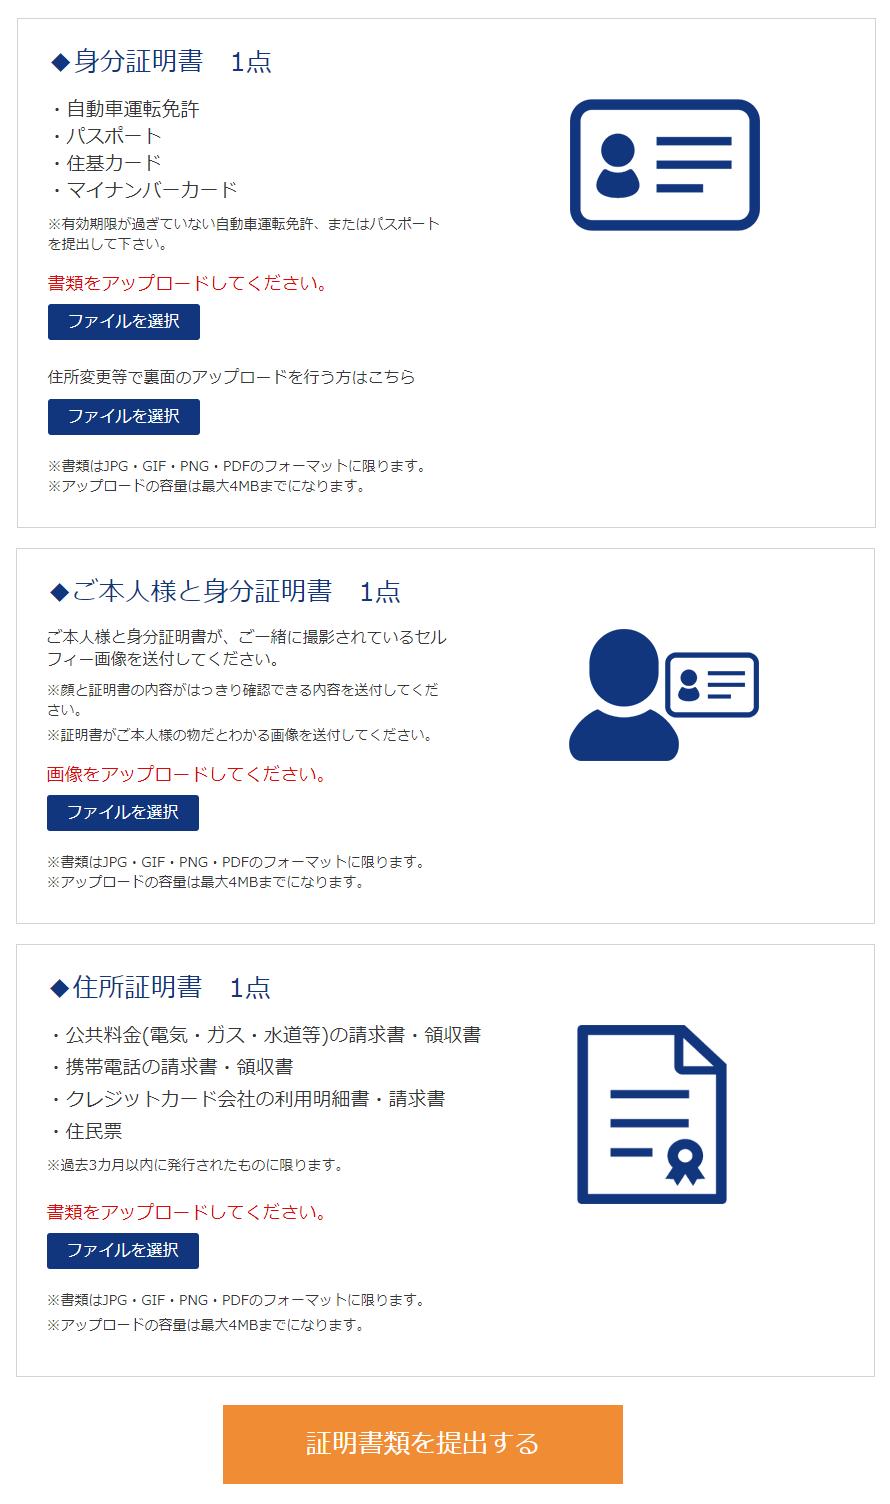 is6com口座開設-身分証明書と住所確認書類のアップロード・提出